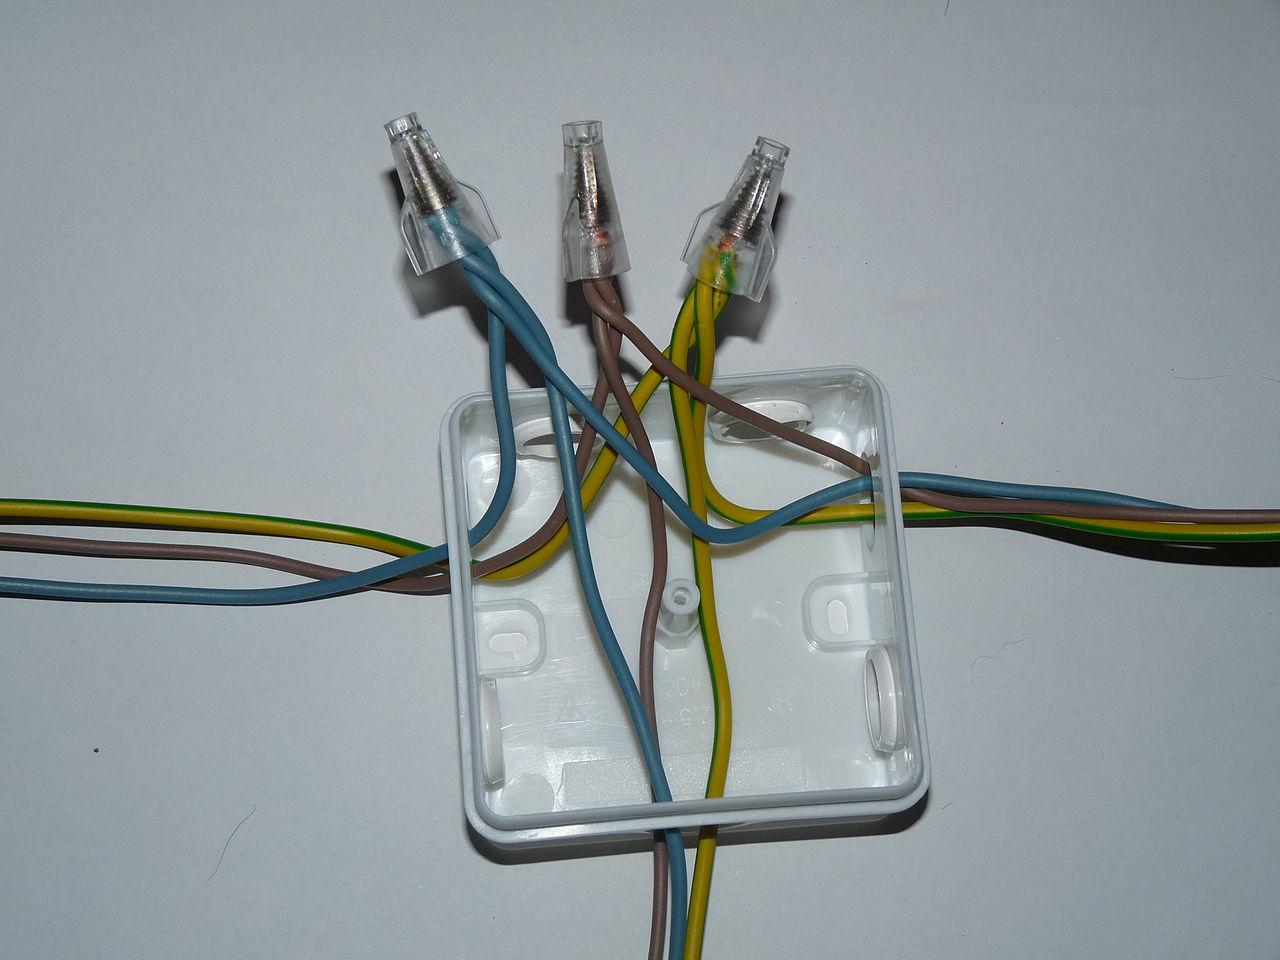 240 Wiring Junction Box - Circuit Wiring And Diagram Hub •